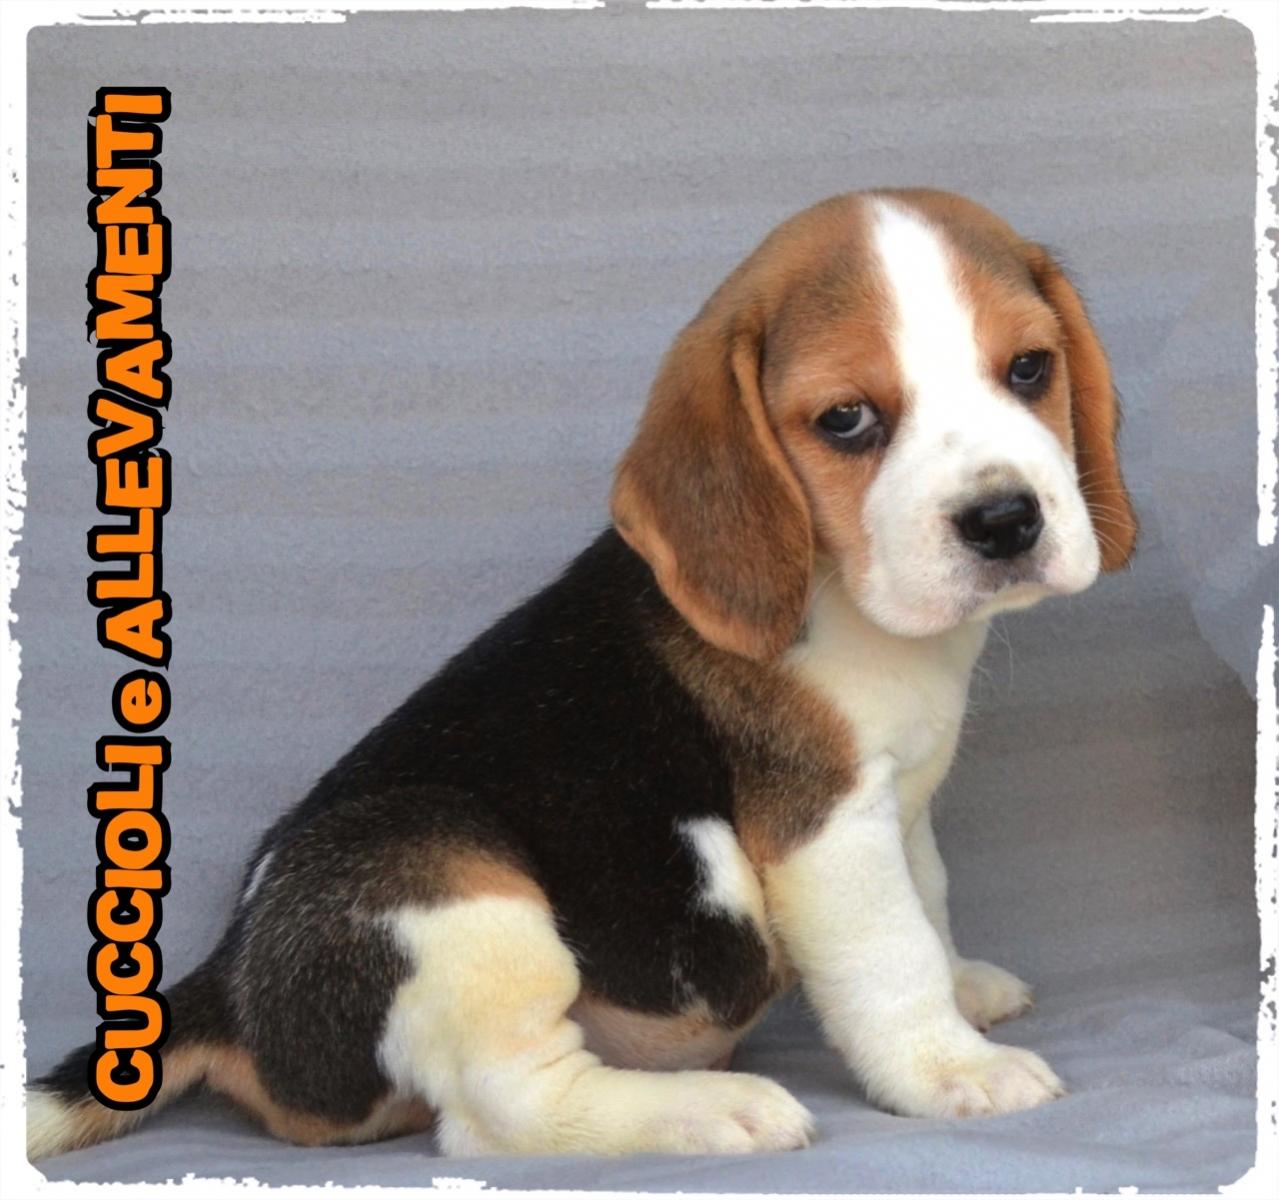 Beagle 27_wm